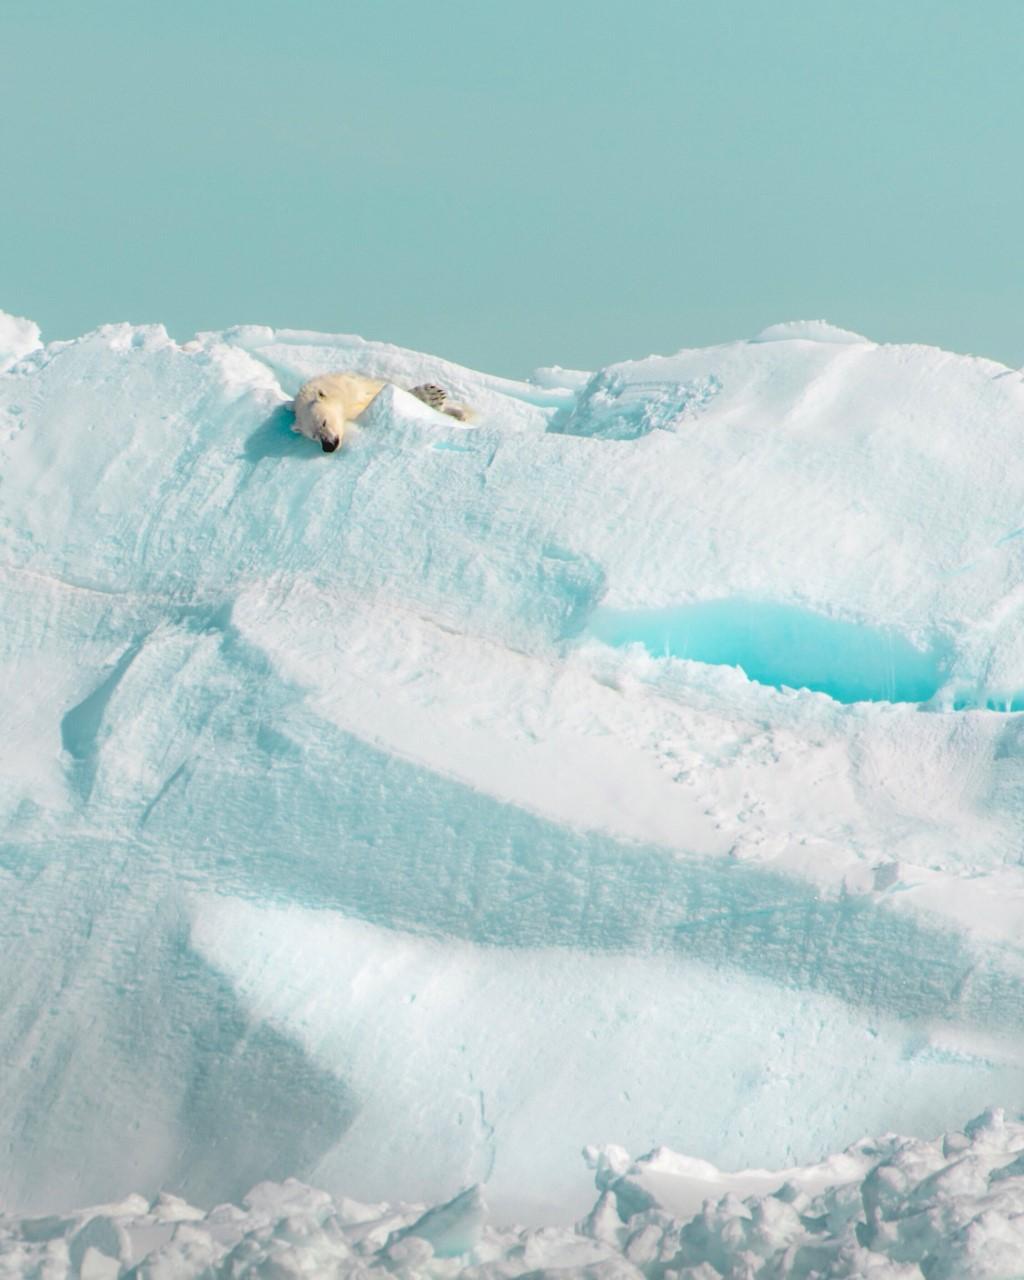 Polar Bear Sleeping on Ice Cliff.jpg